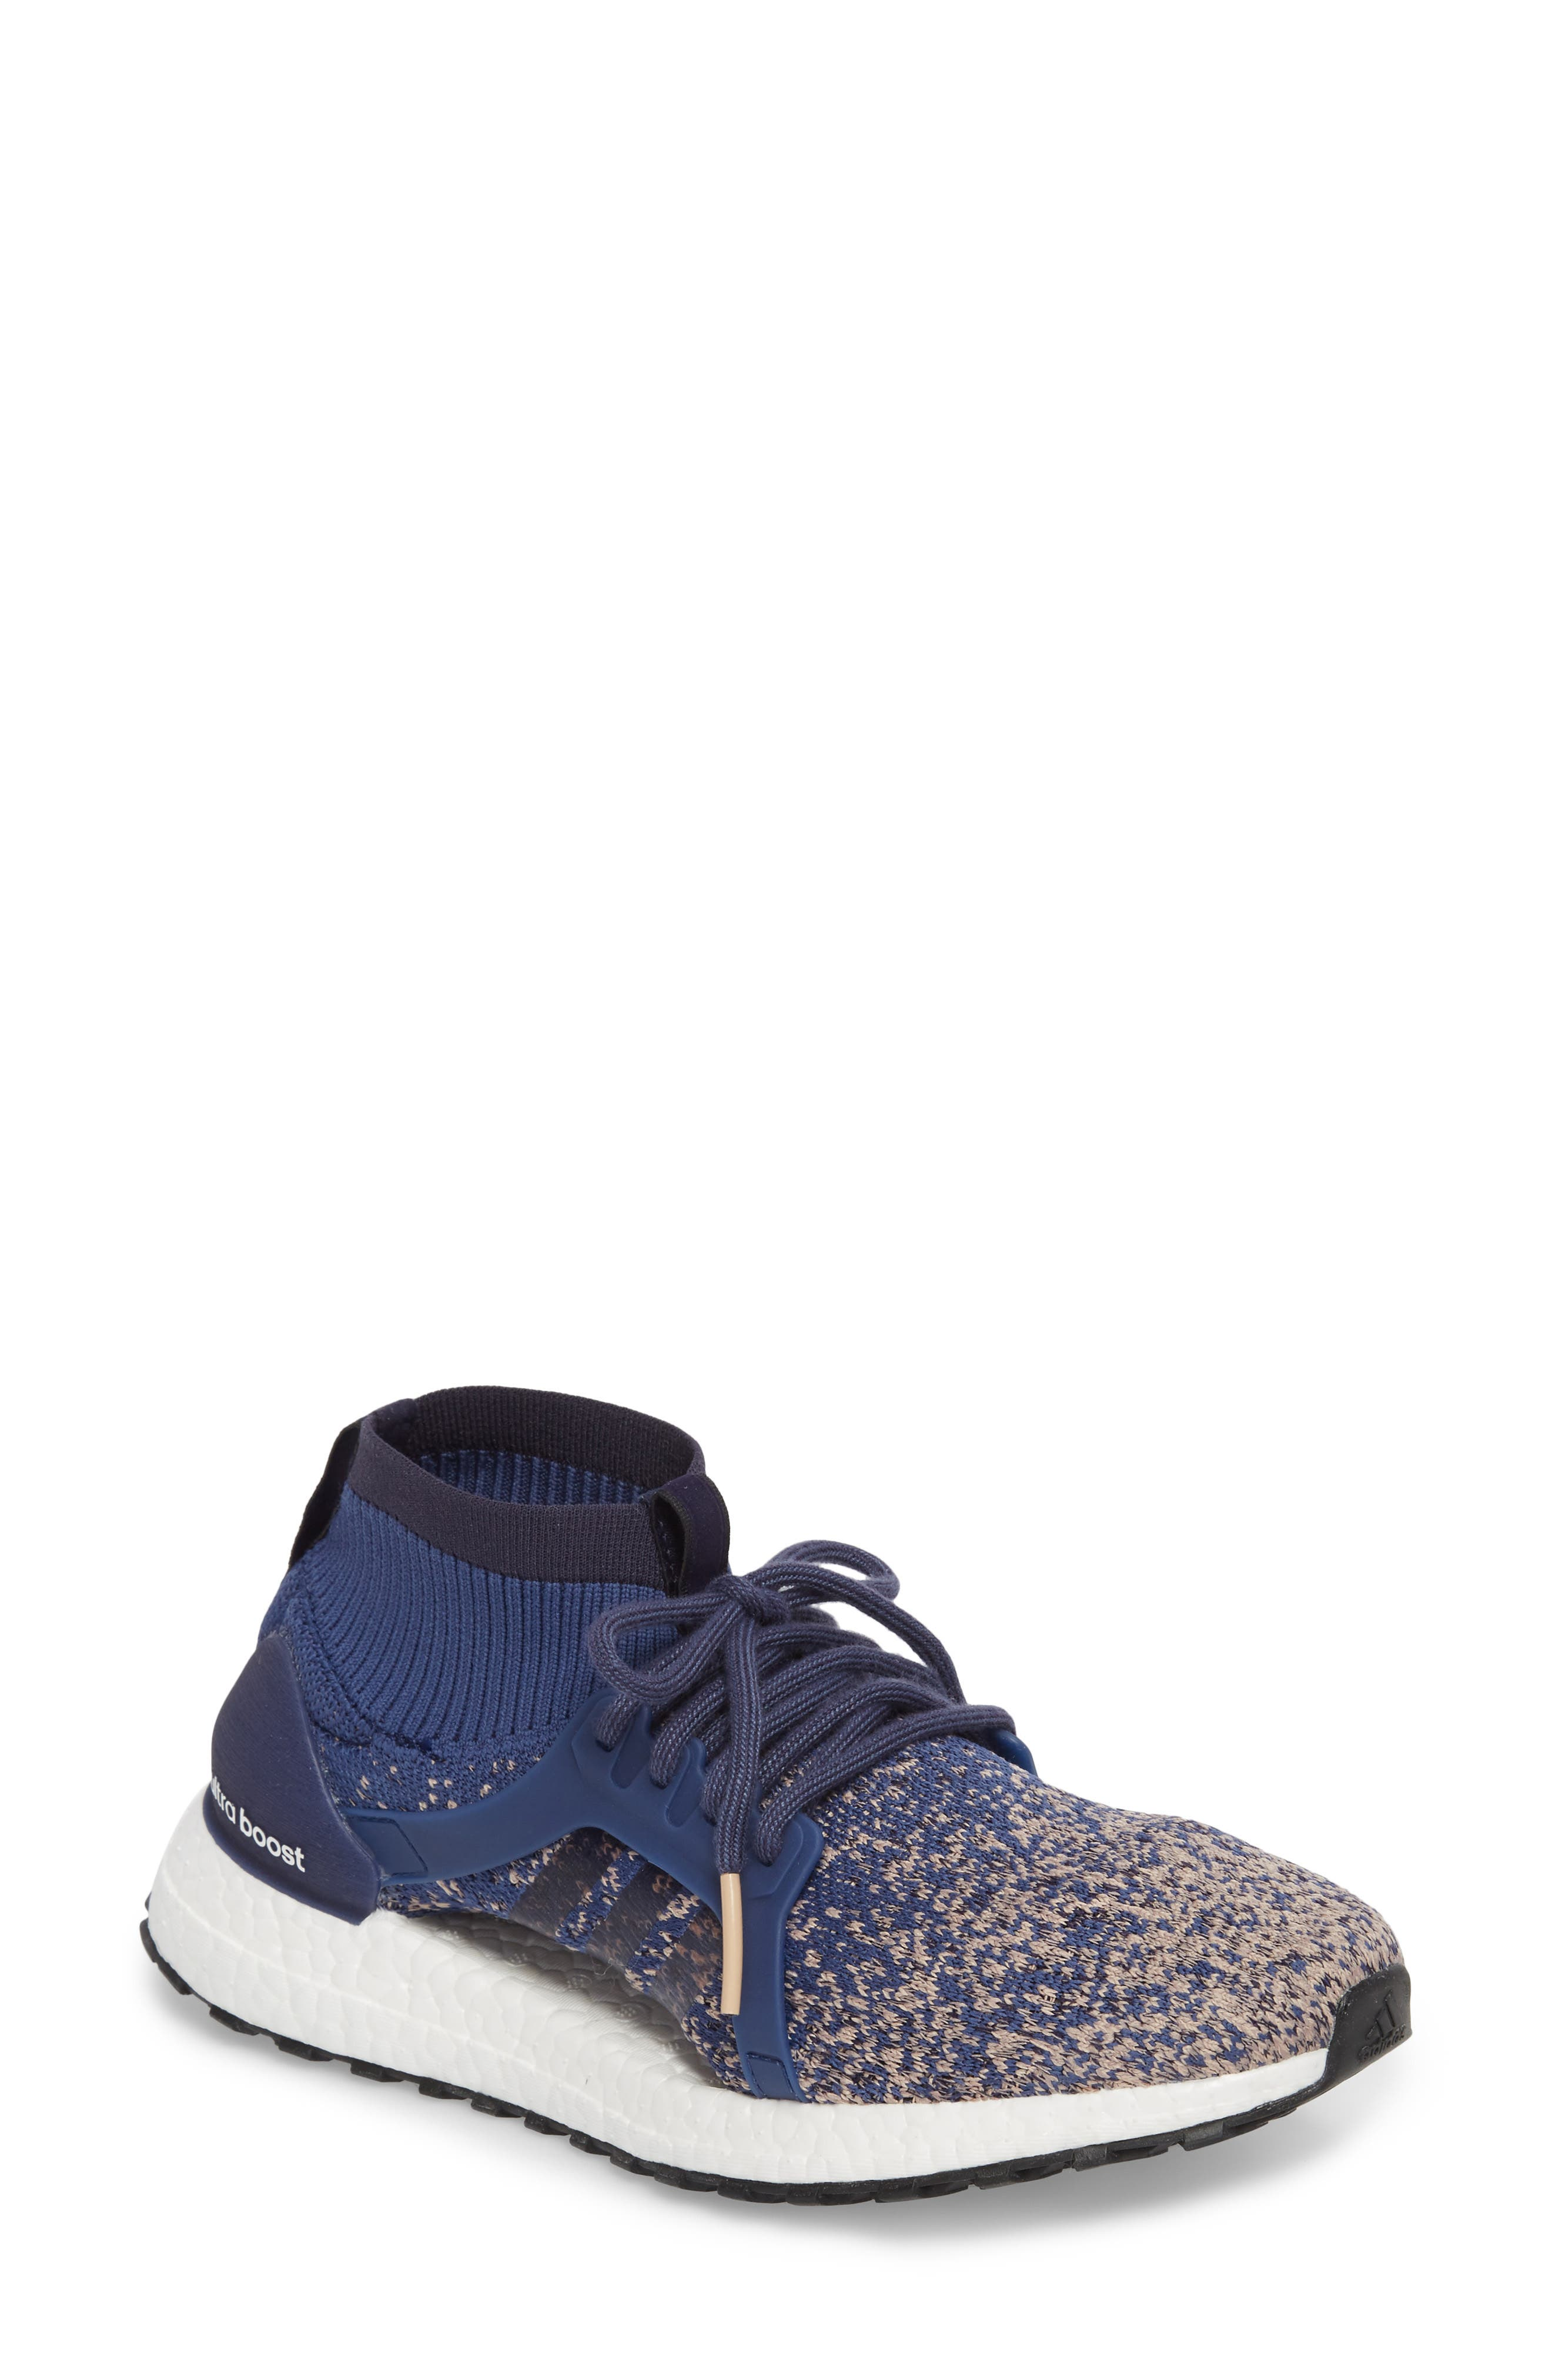 b3b42fd387d Zapatillas para correr Adidas jóvenes Adidas Zapatillas para jóvenes ...